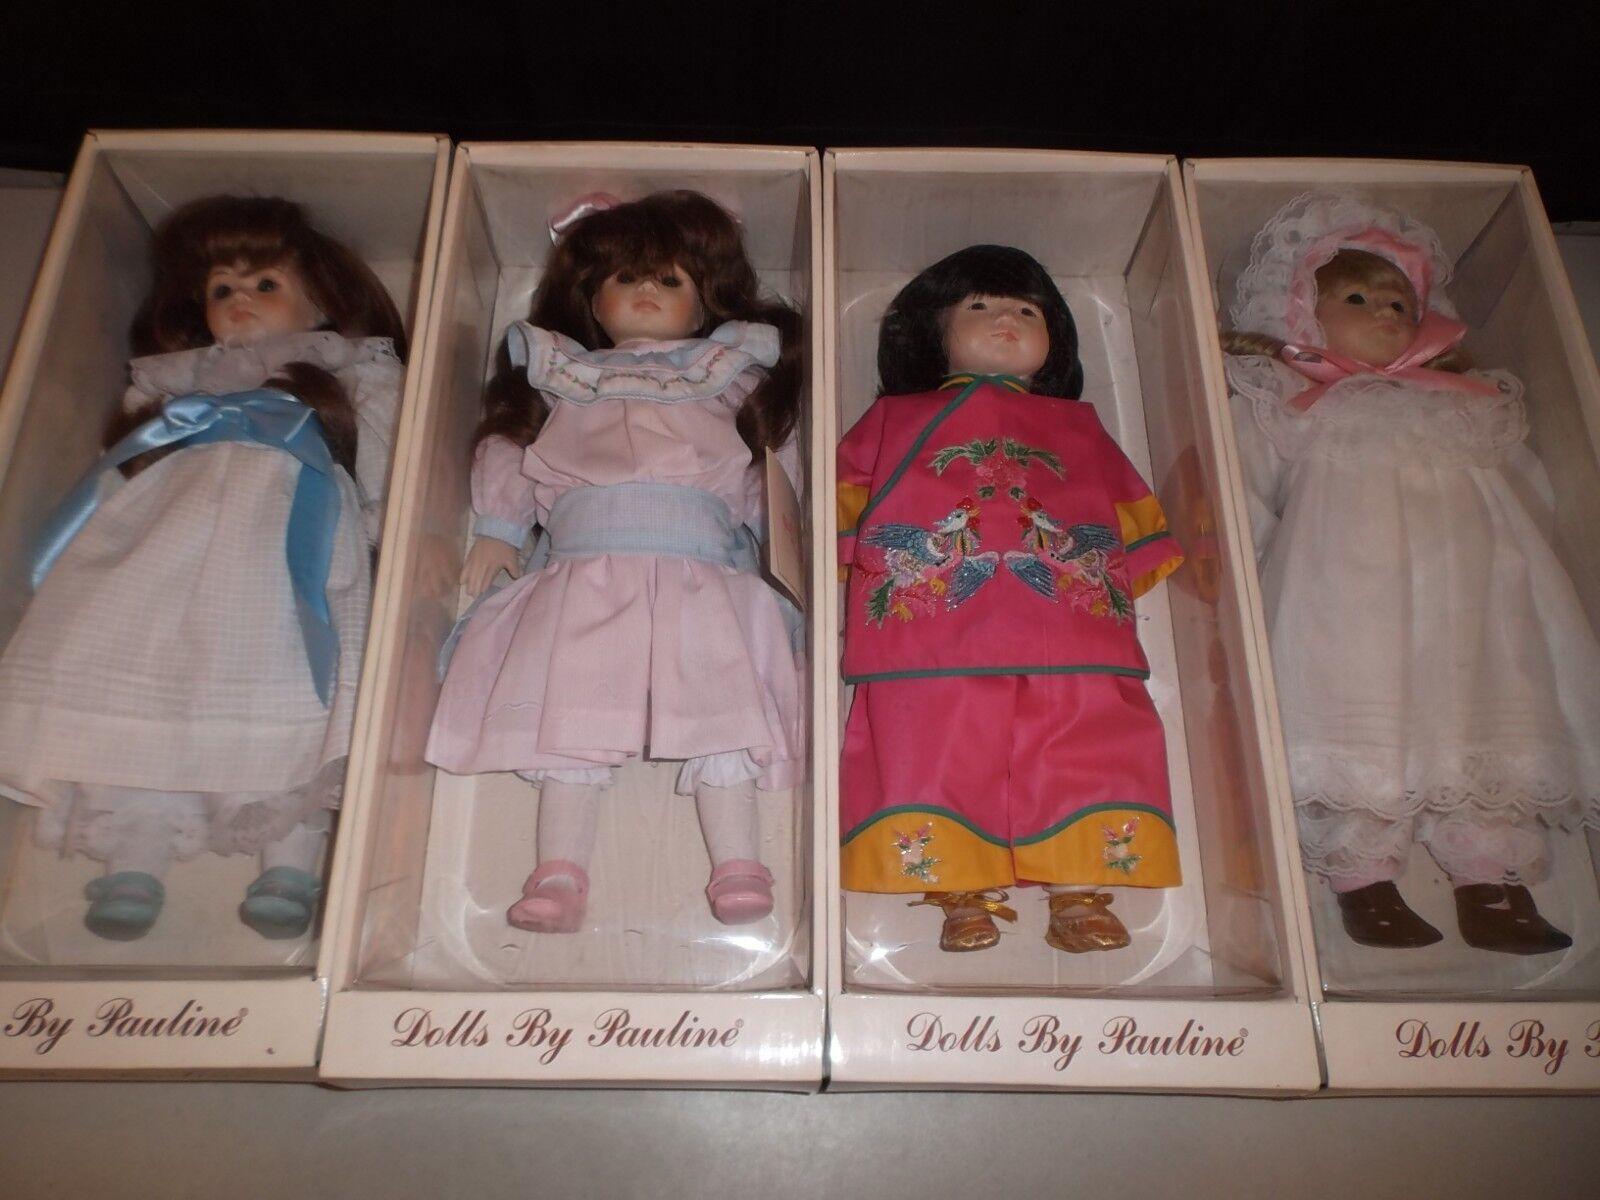 Muñecas Por Pauline (Lote de 4) 18  Ltd (bjonness Jacobson) Chloe, Allison  2